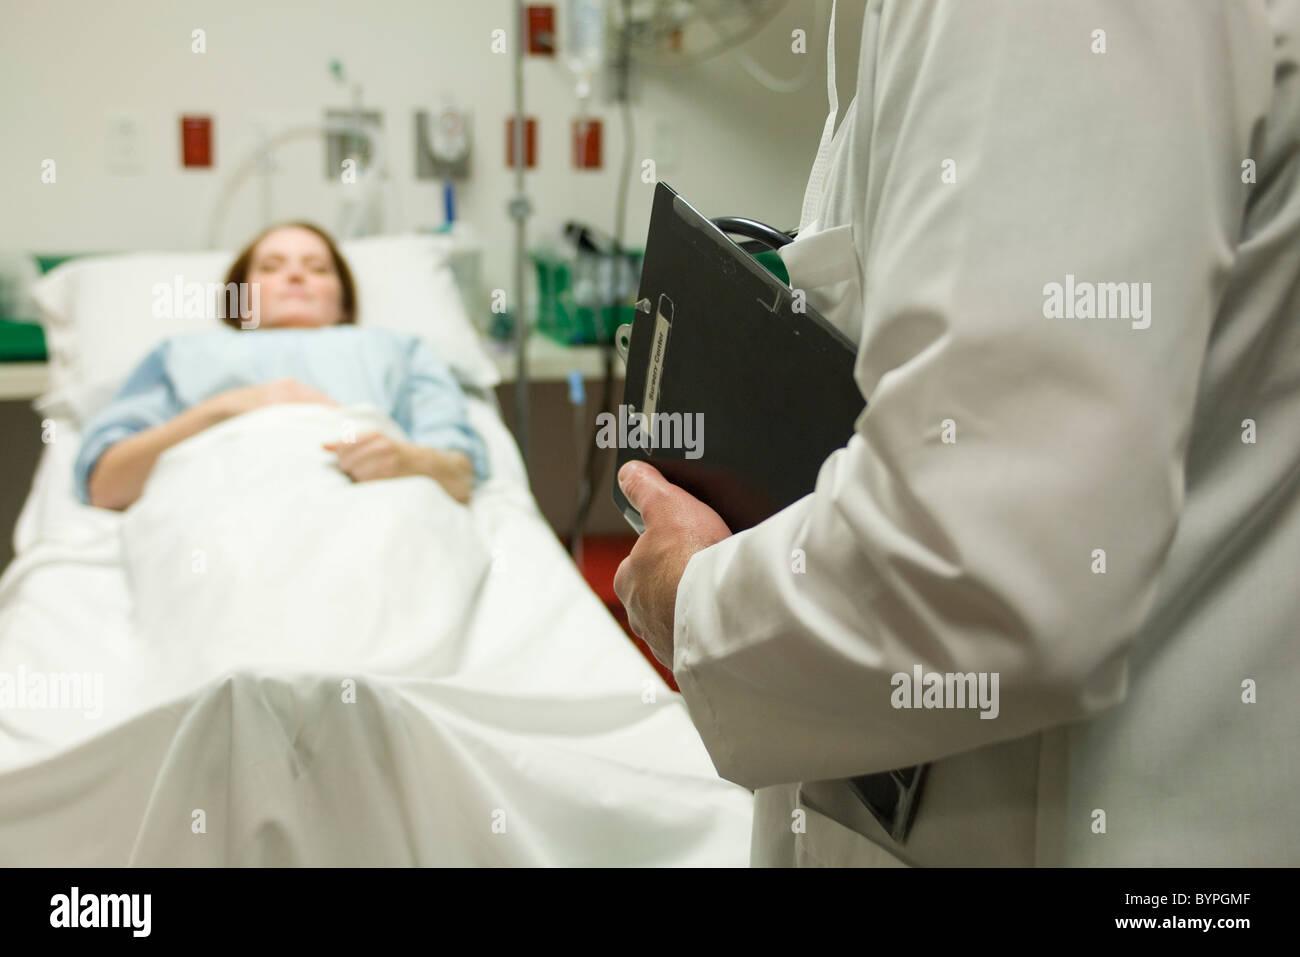 Surveillance médecin patient in hospital Photo Stock